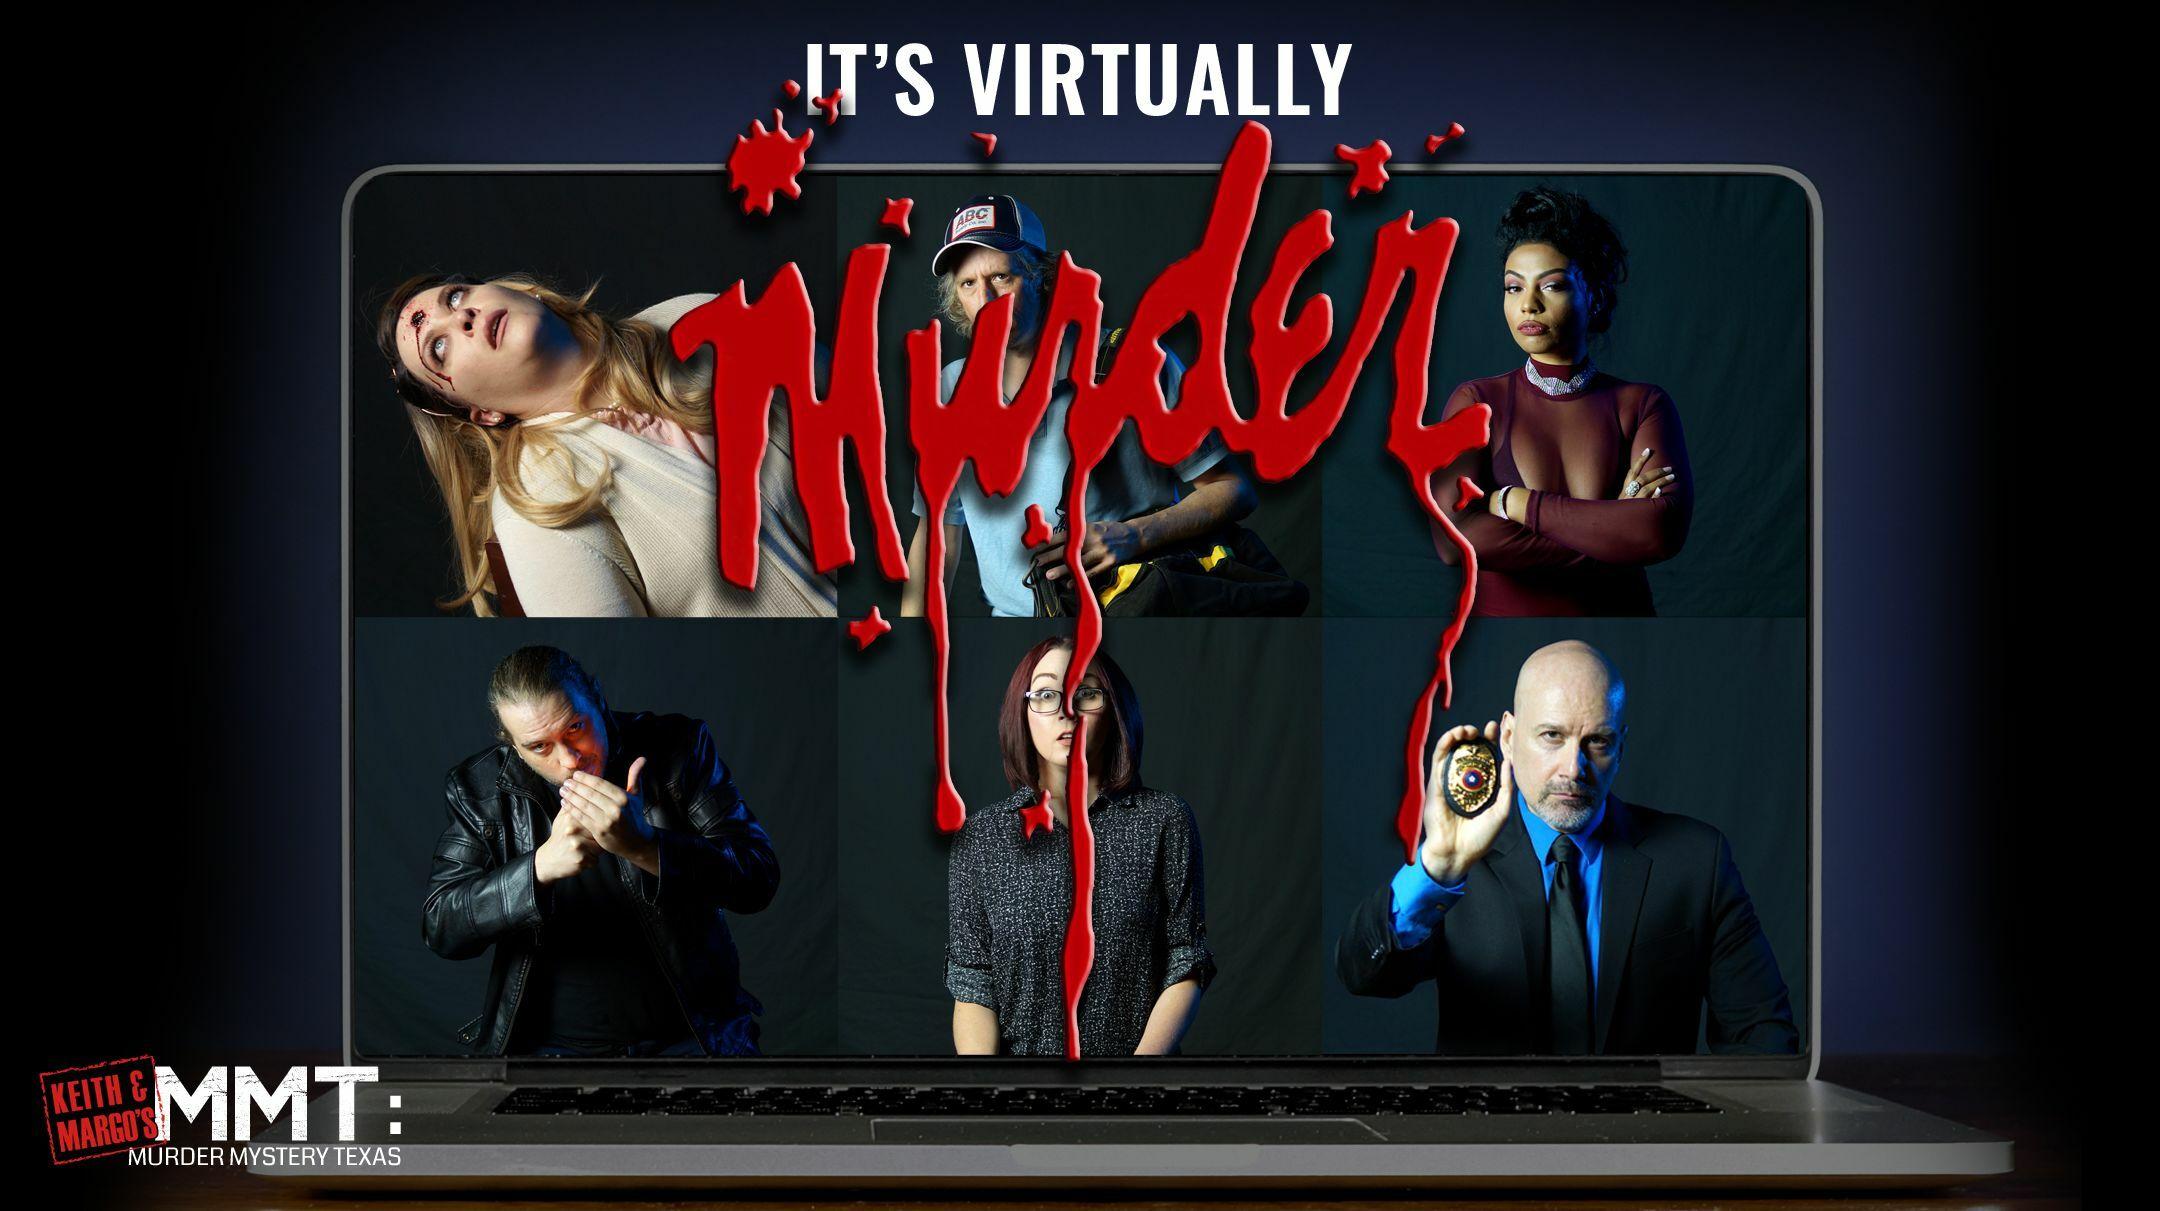 """It's Virtually Murder"": Solve an Online Murder Mystery via Zoom"